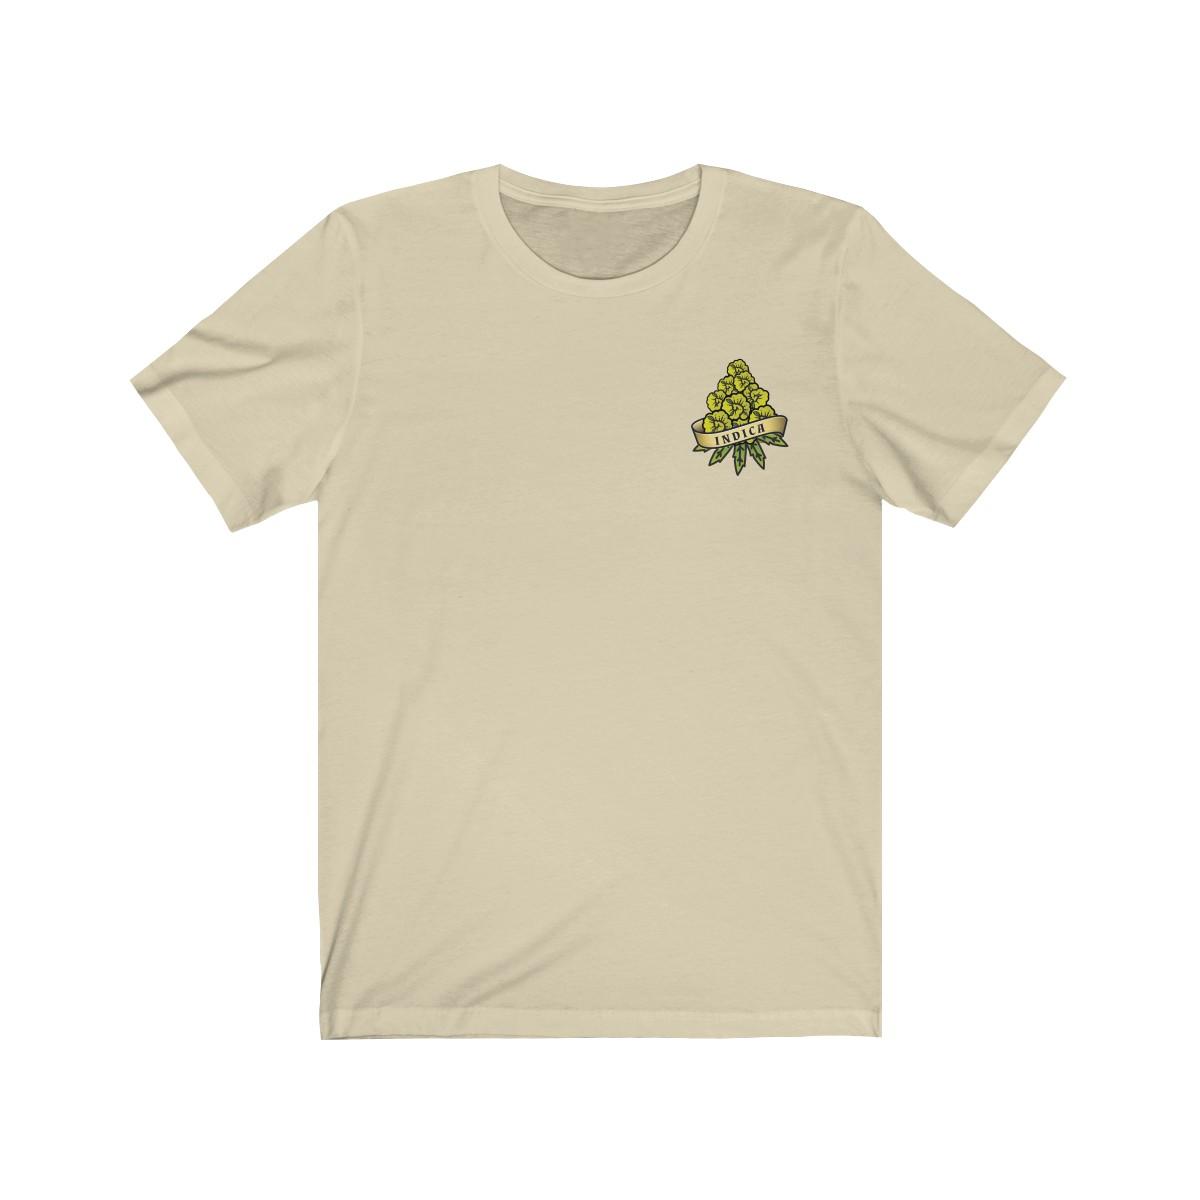 692d4d87 Indica T-shirt, Urbannis T-shirt, 420 Life Tshirt, 420 Tshirt